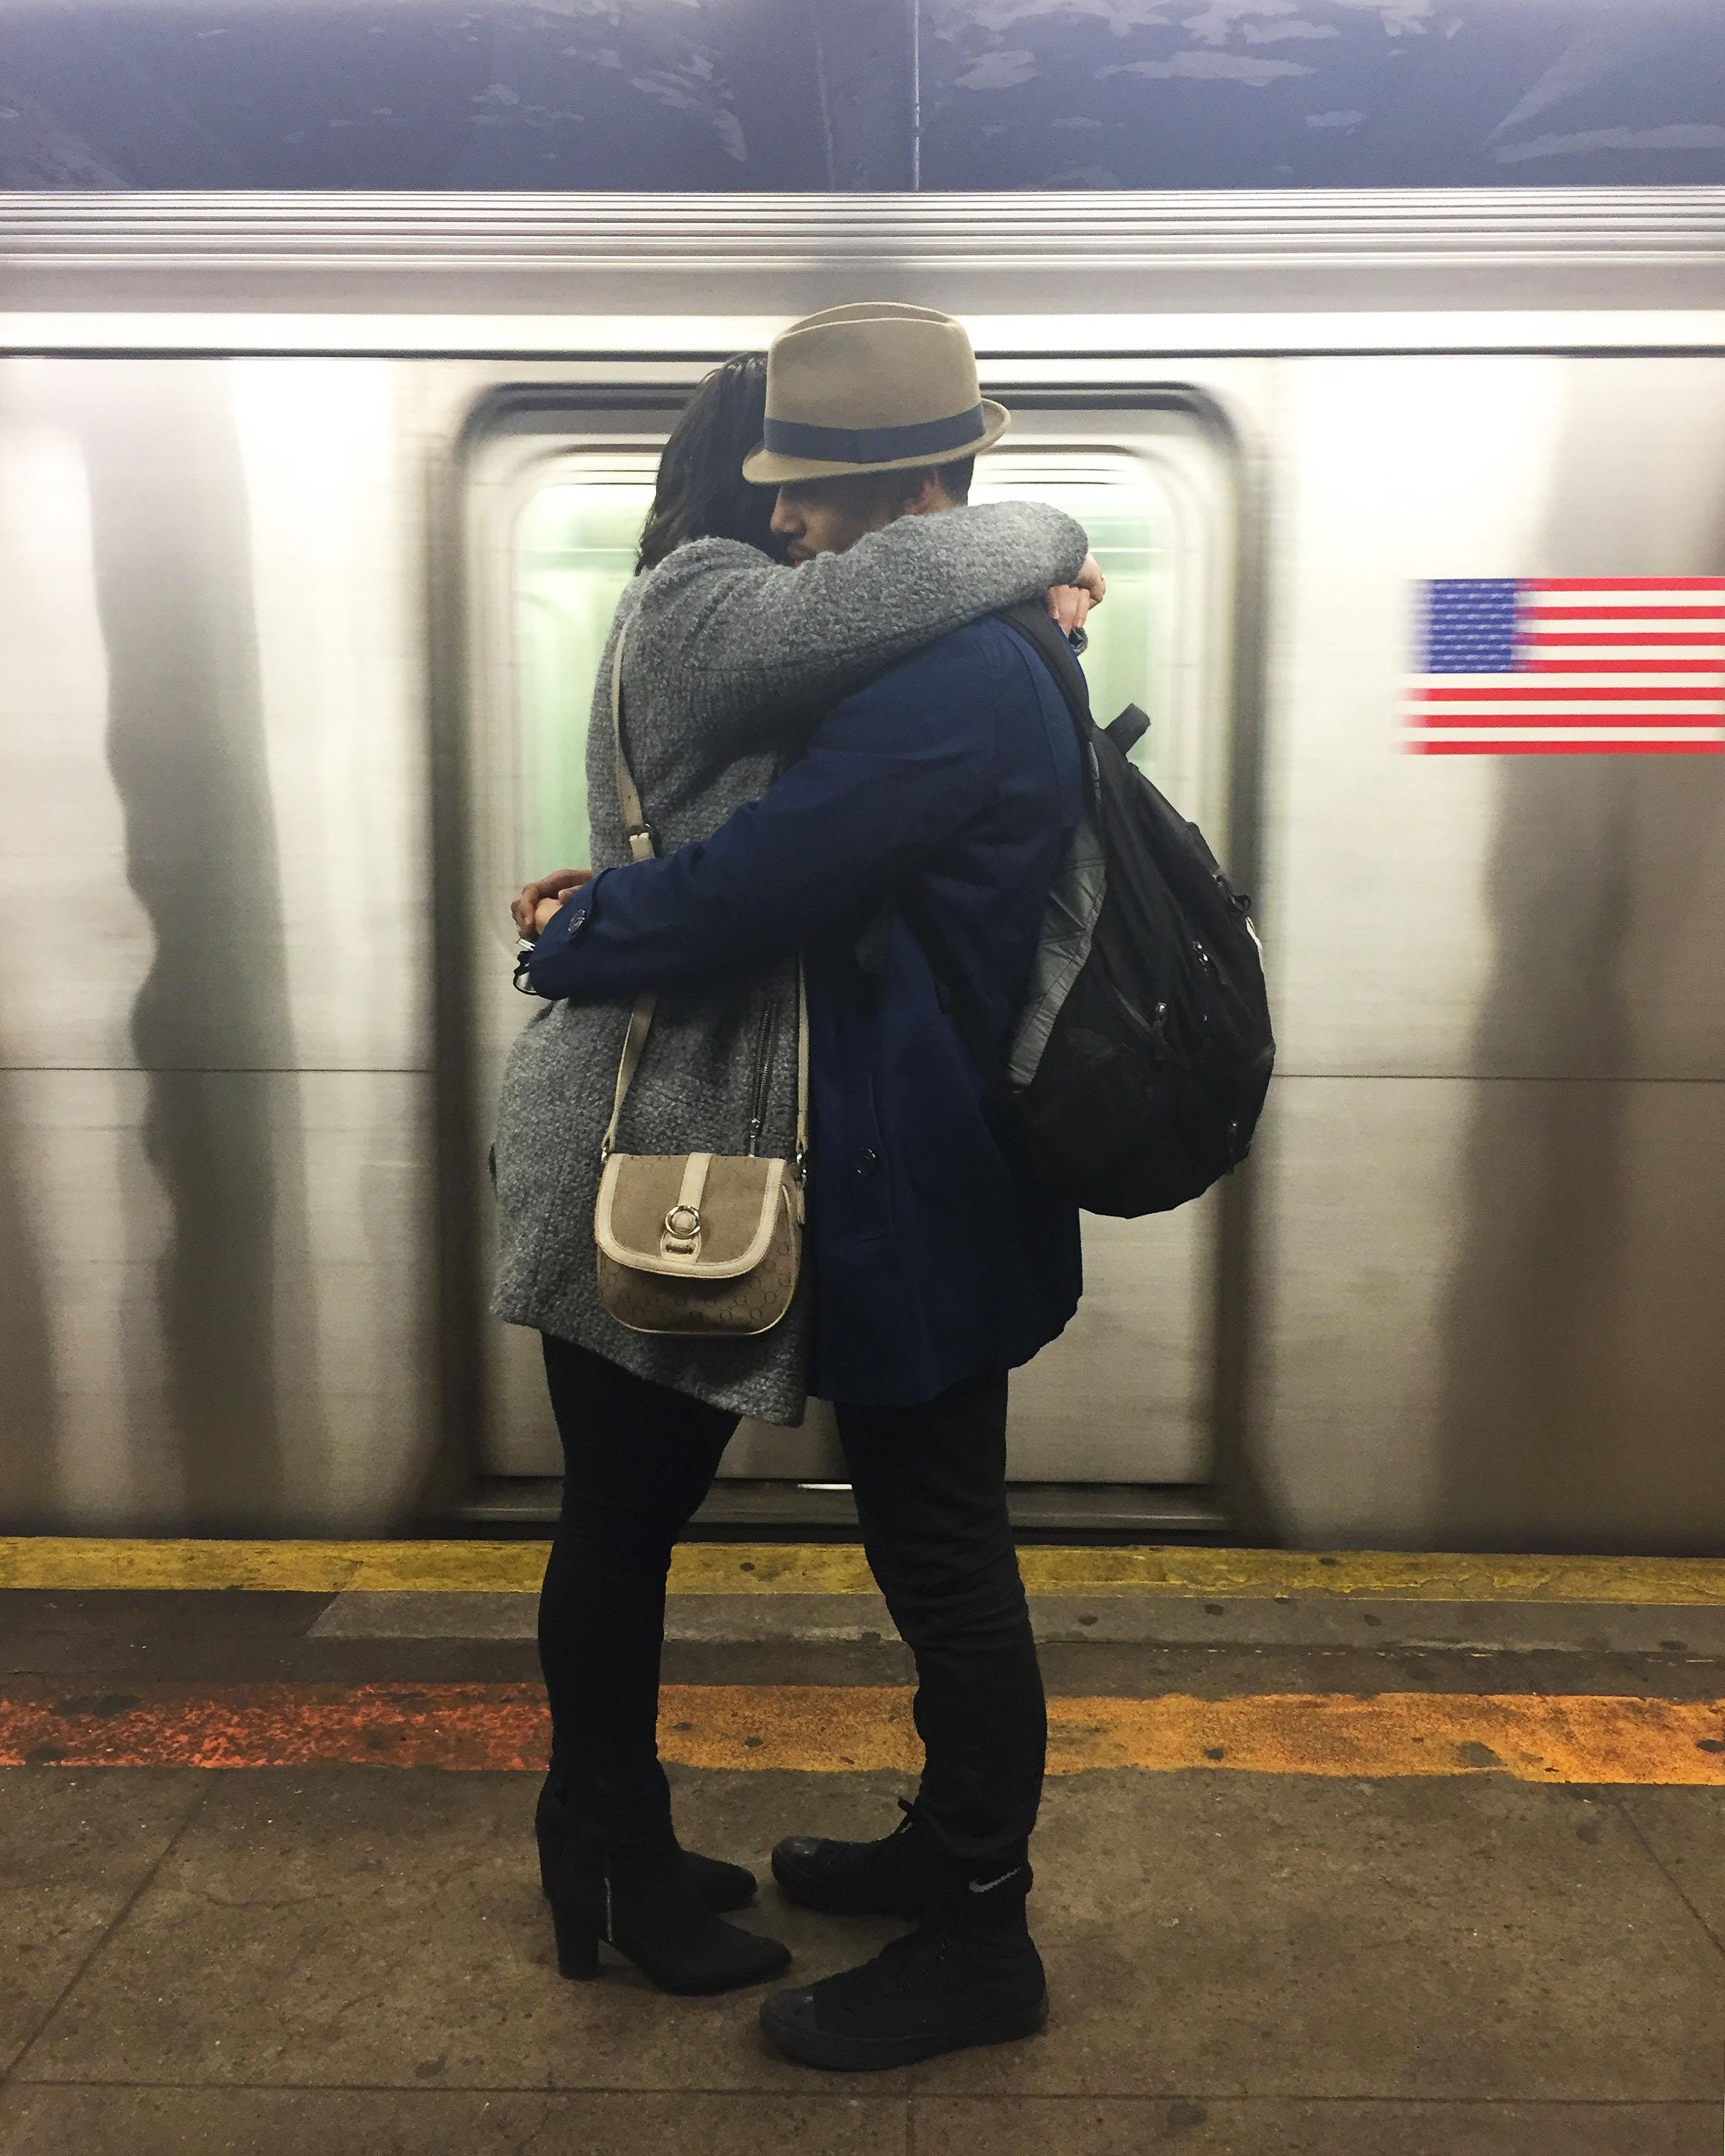 PE_Subway_Embrace.jpg